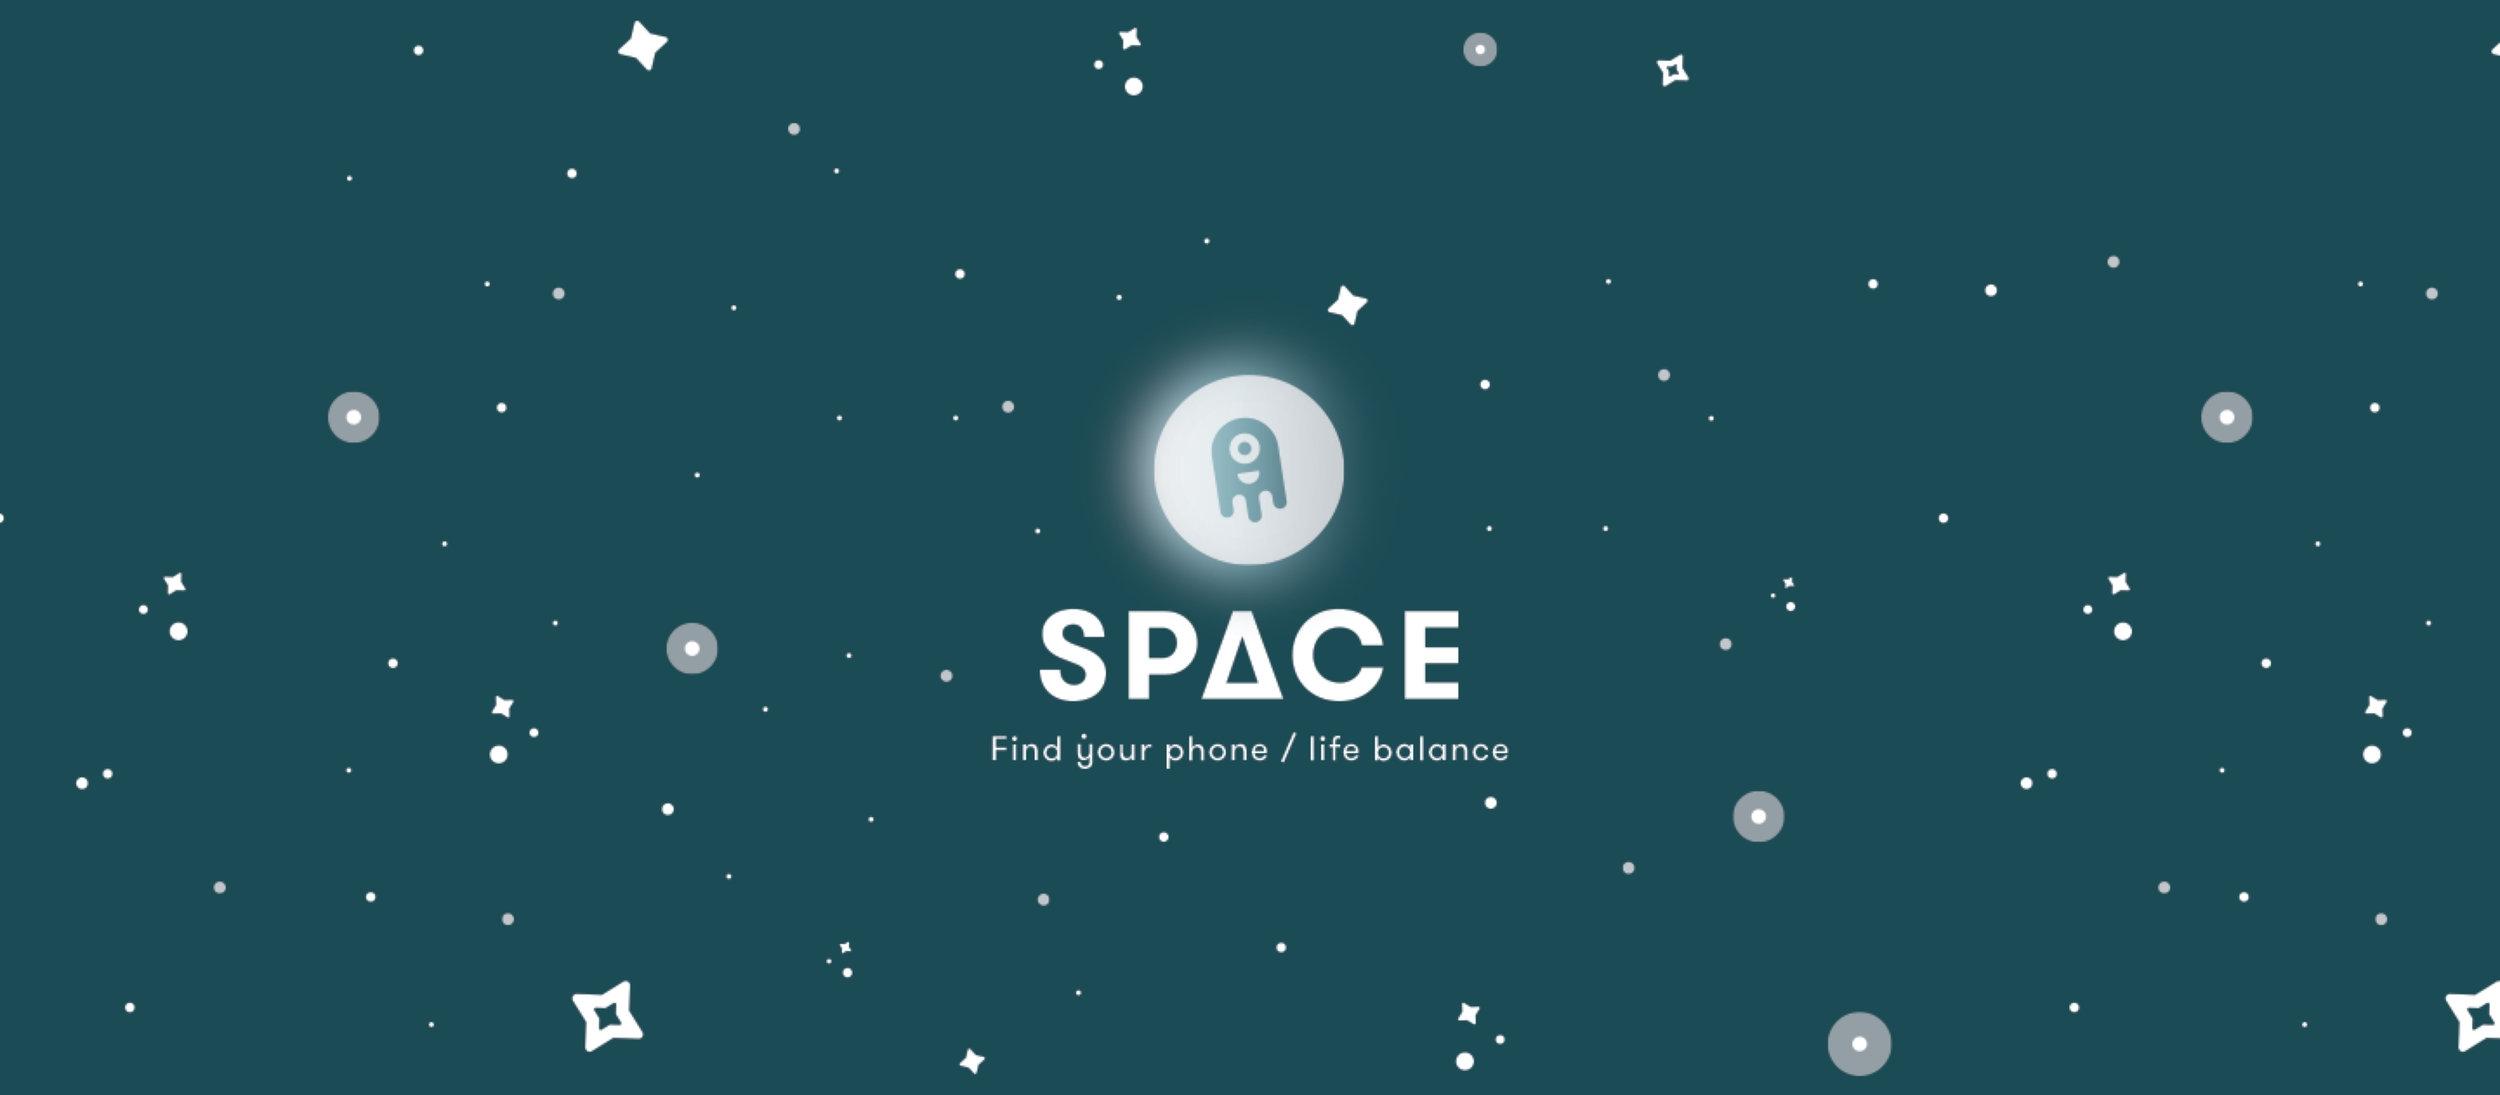 free space app